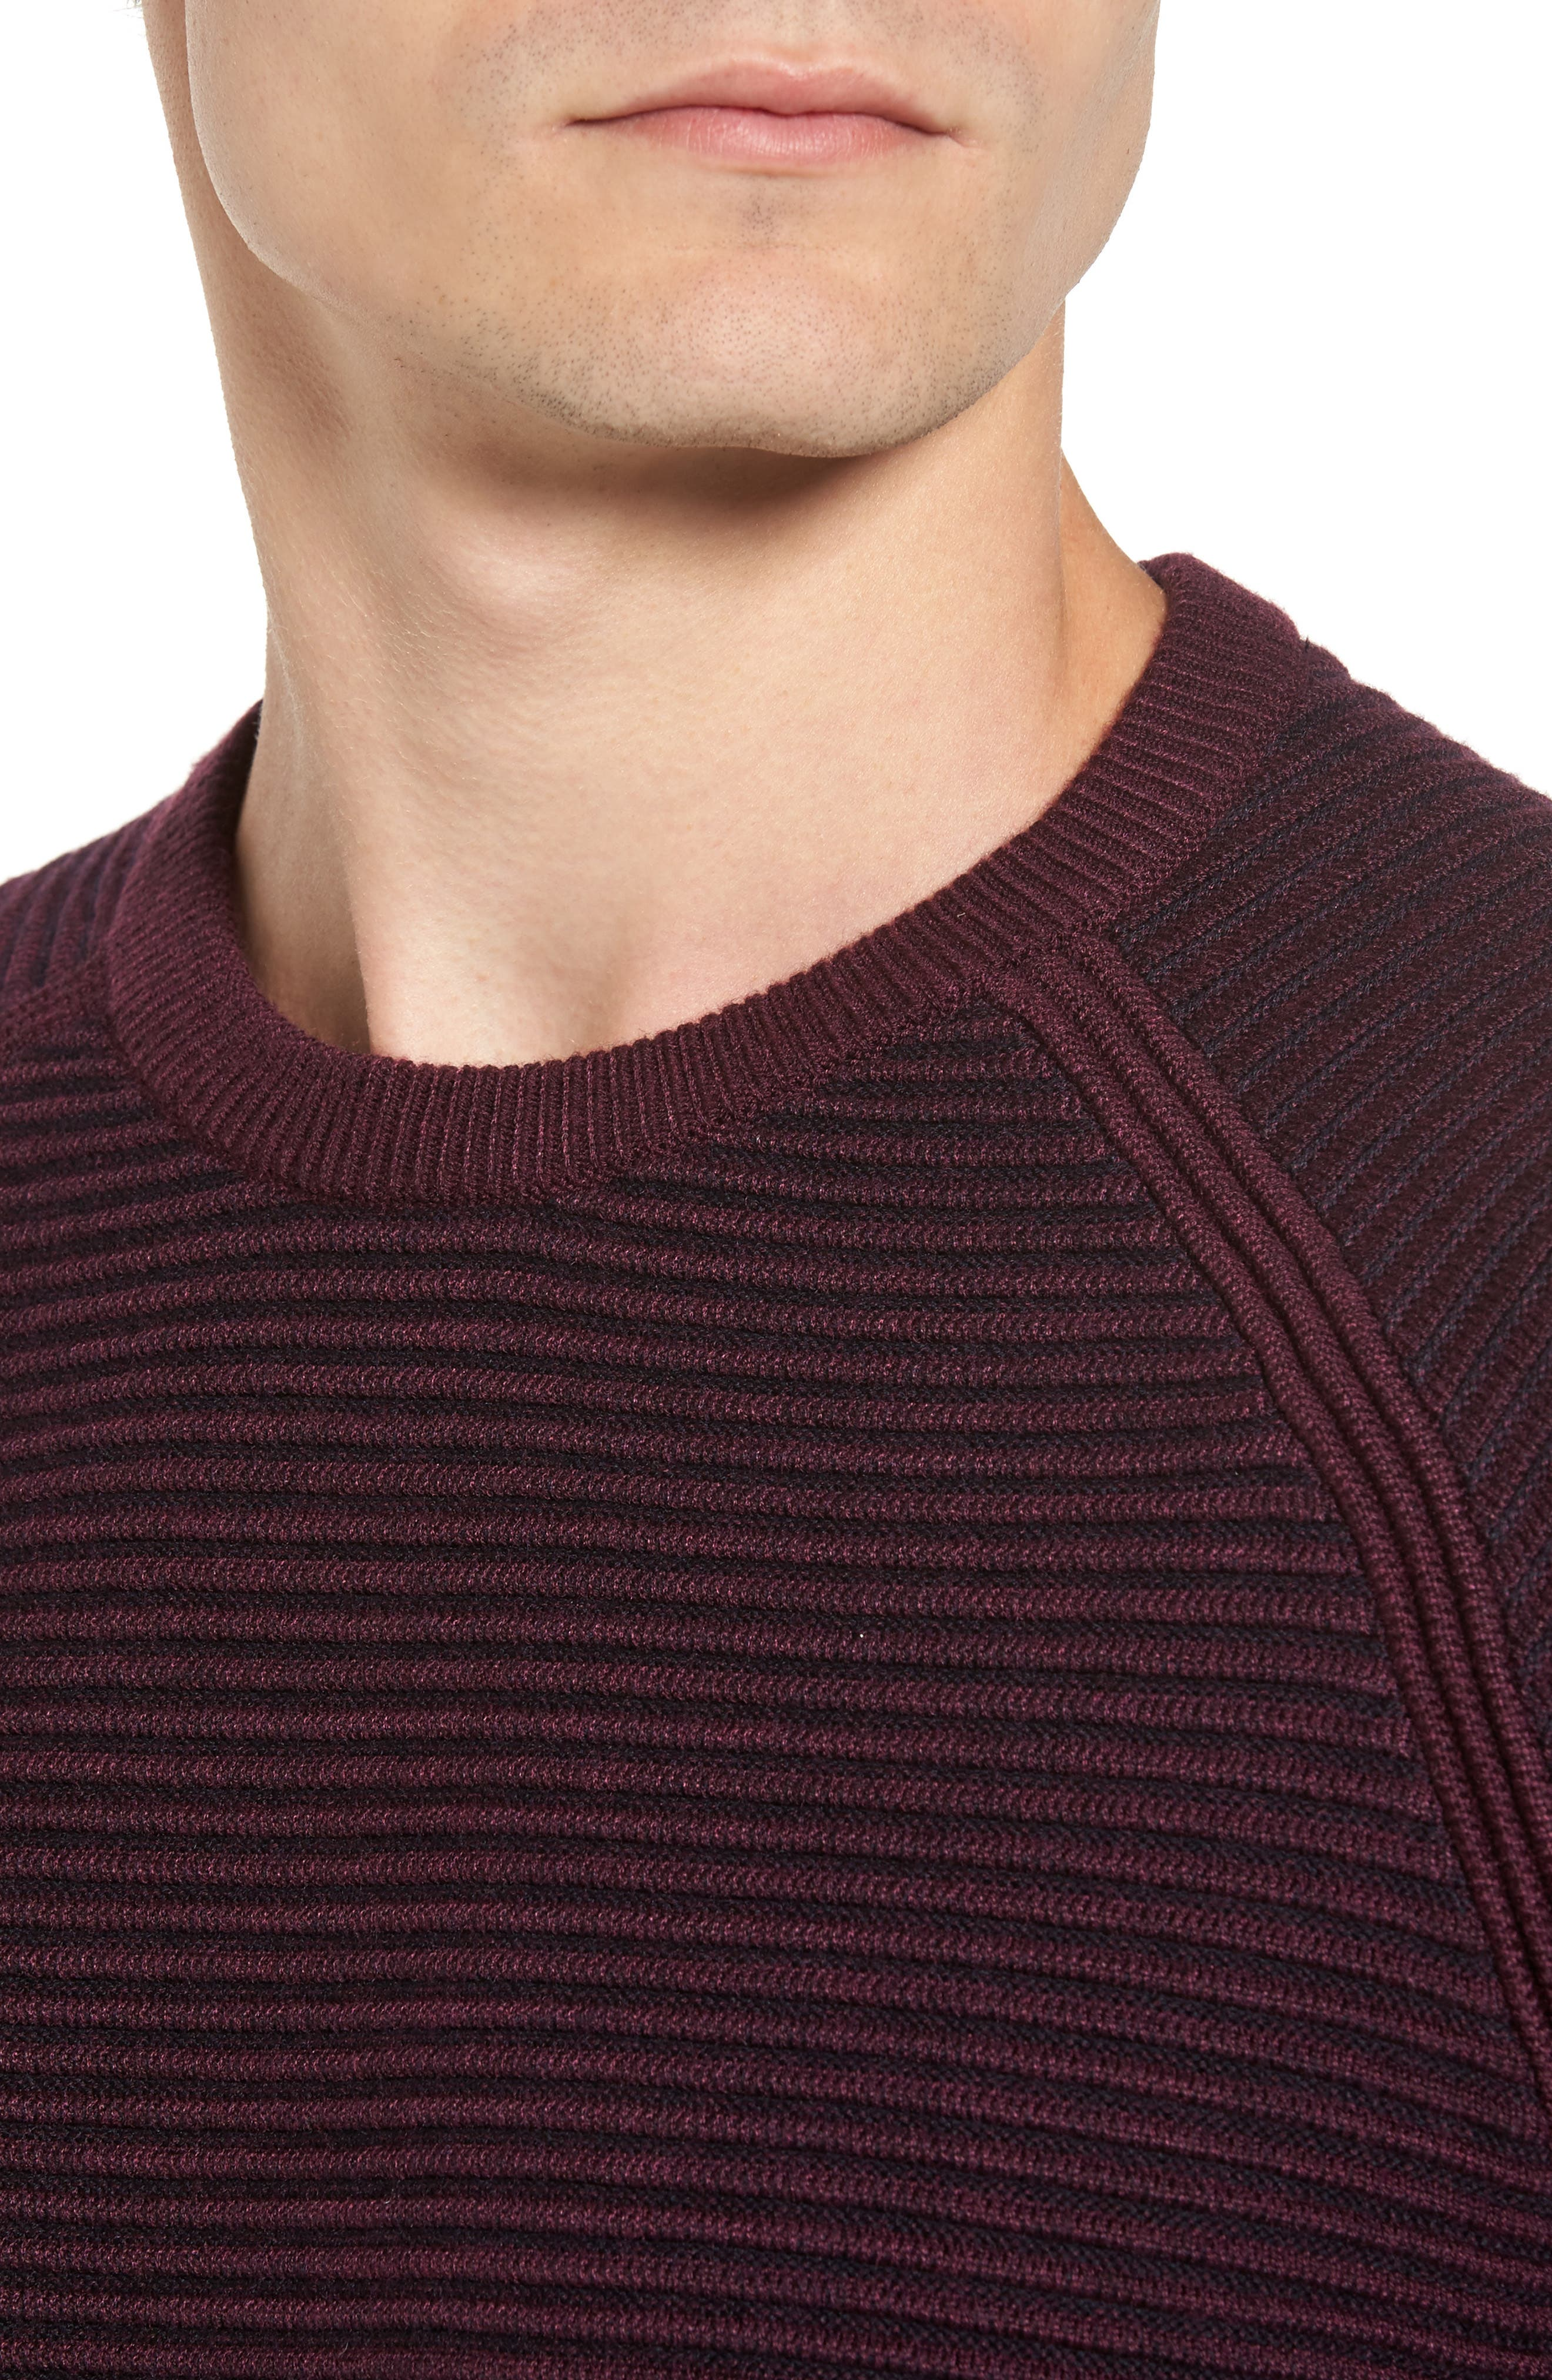 Cashoo Slim Fit Ribbed Sweatshirt,                             Alternate thumbnail 4, color,                             Purple